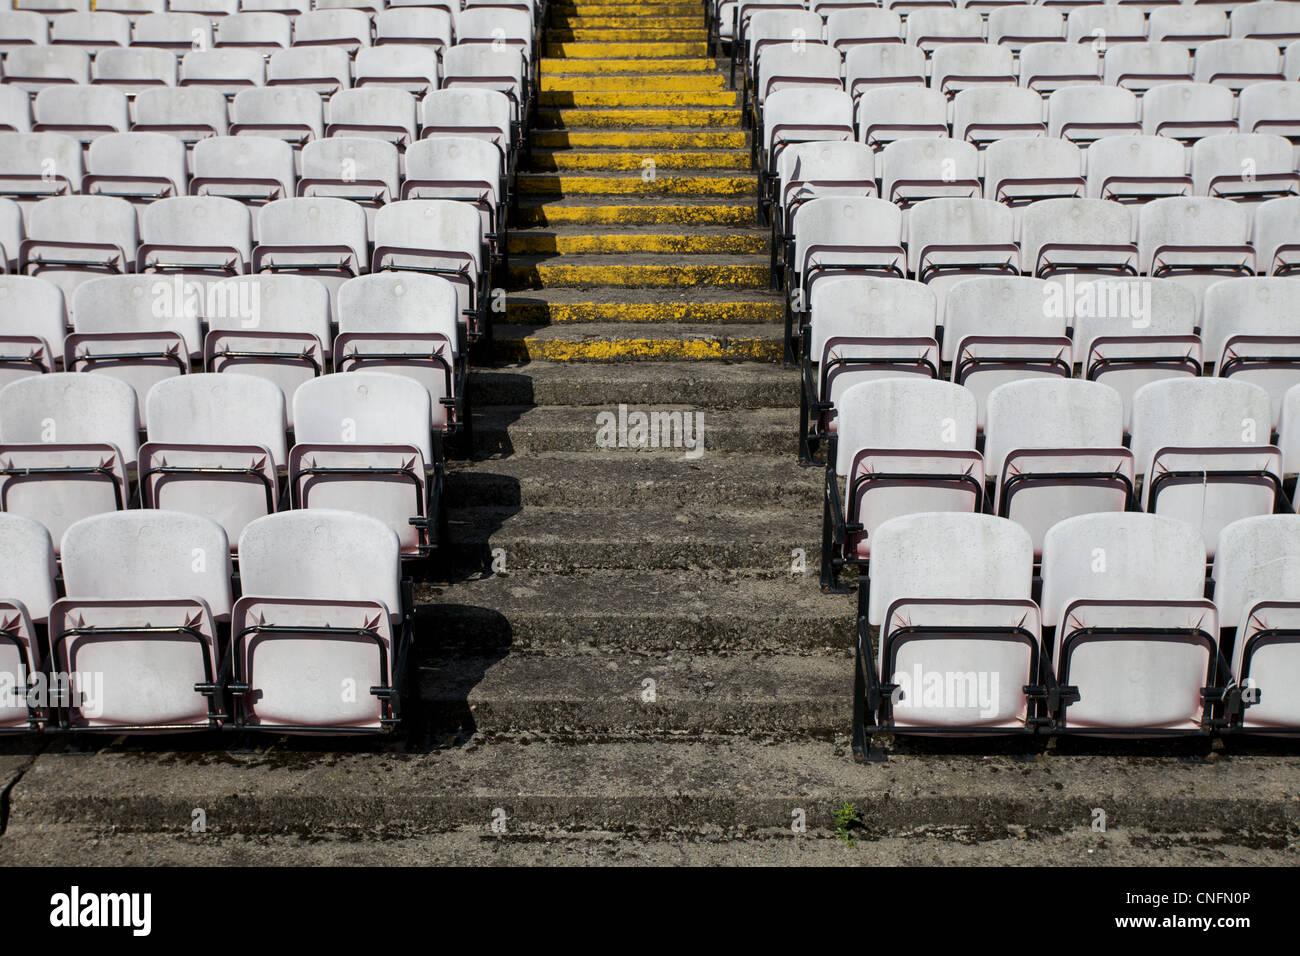 Dalymount Park football stadium in Dublin, Ireland. - Stock Image